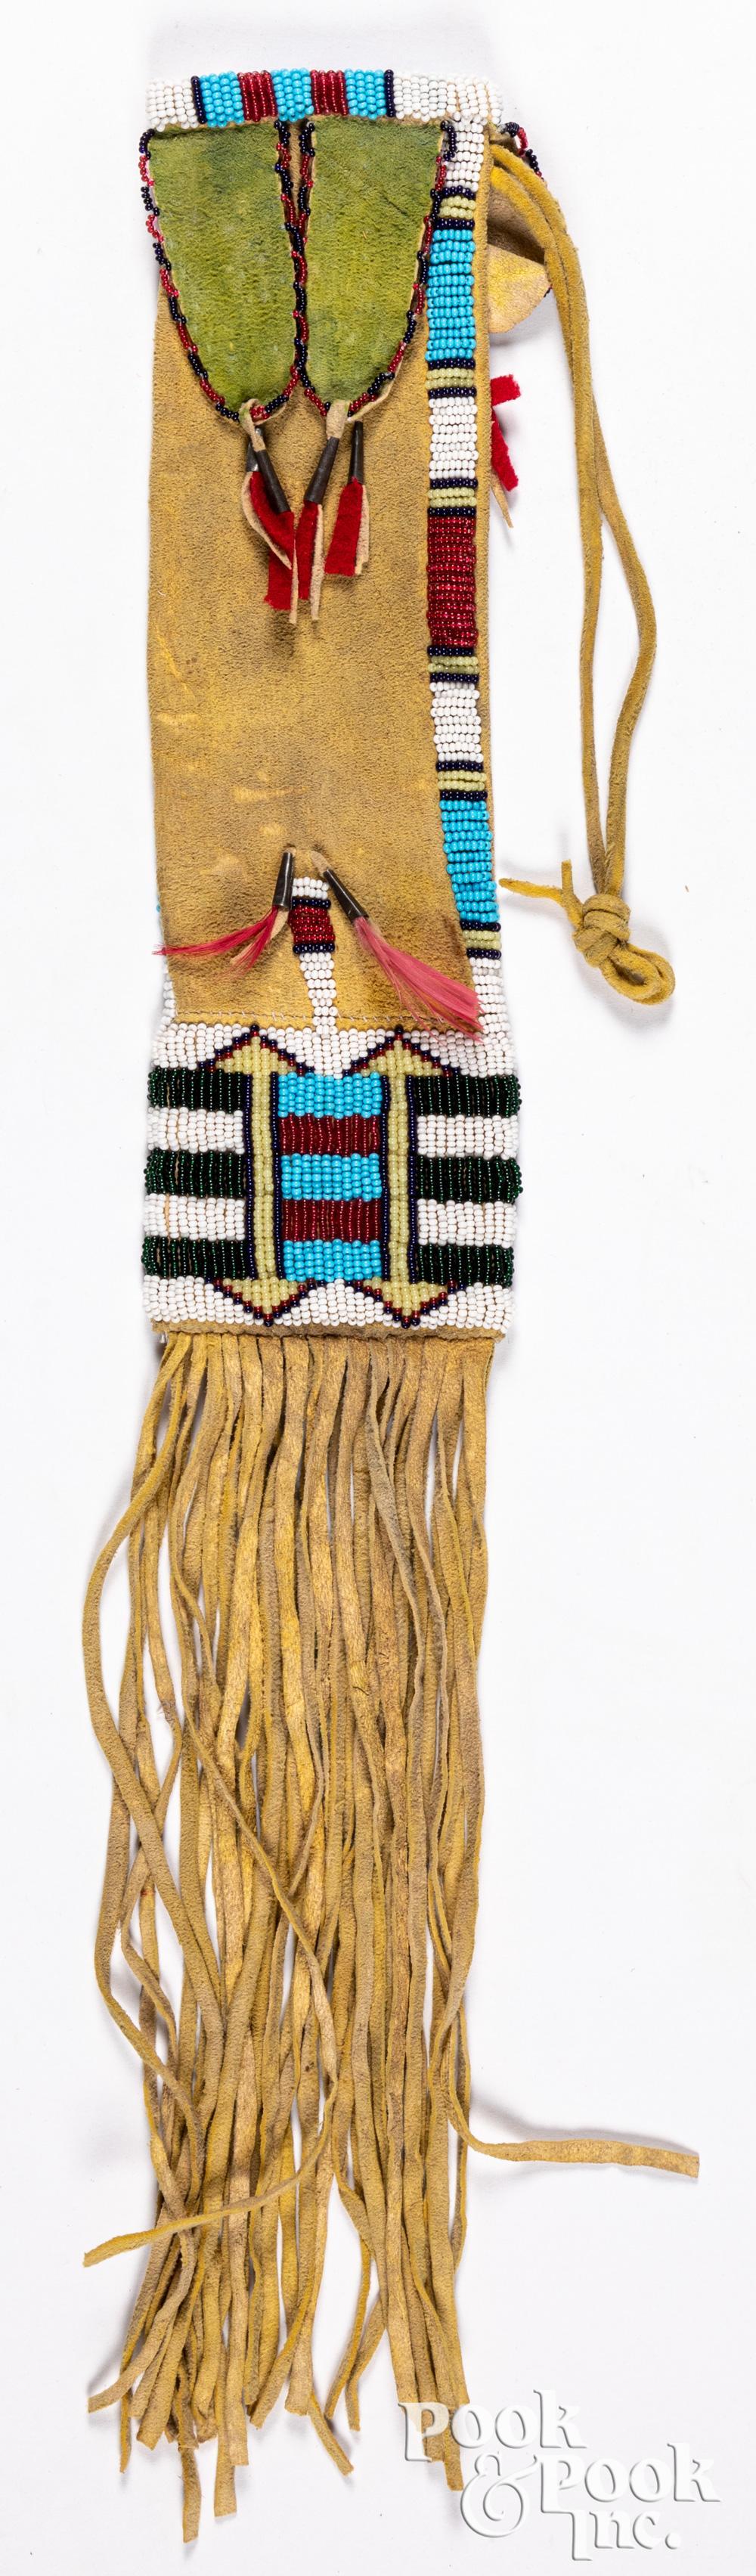 Native American Indian beaded pipe bag